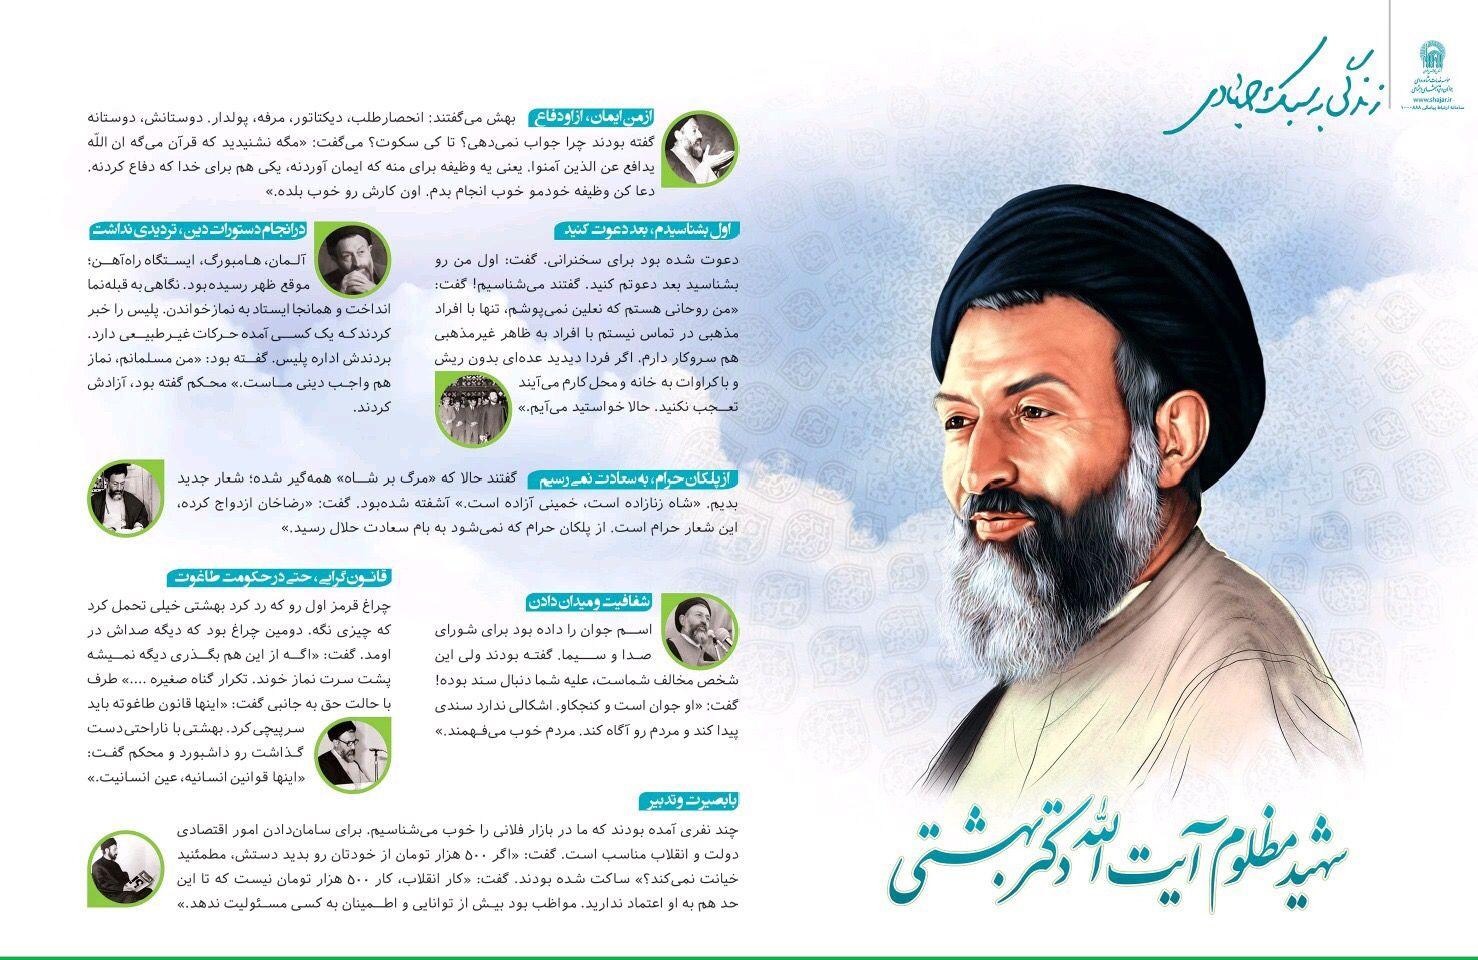 Pin By Yekta On Shia Muslim Shia Muslim Scholar Historical Figures